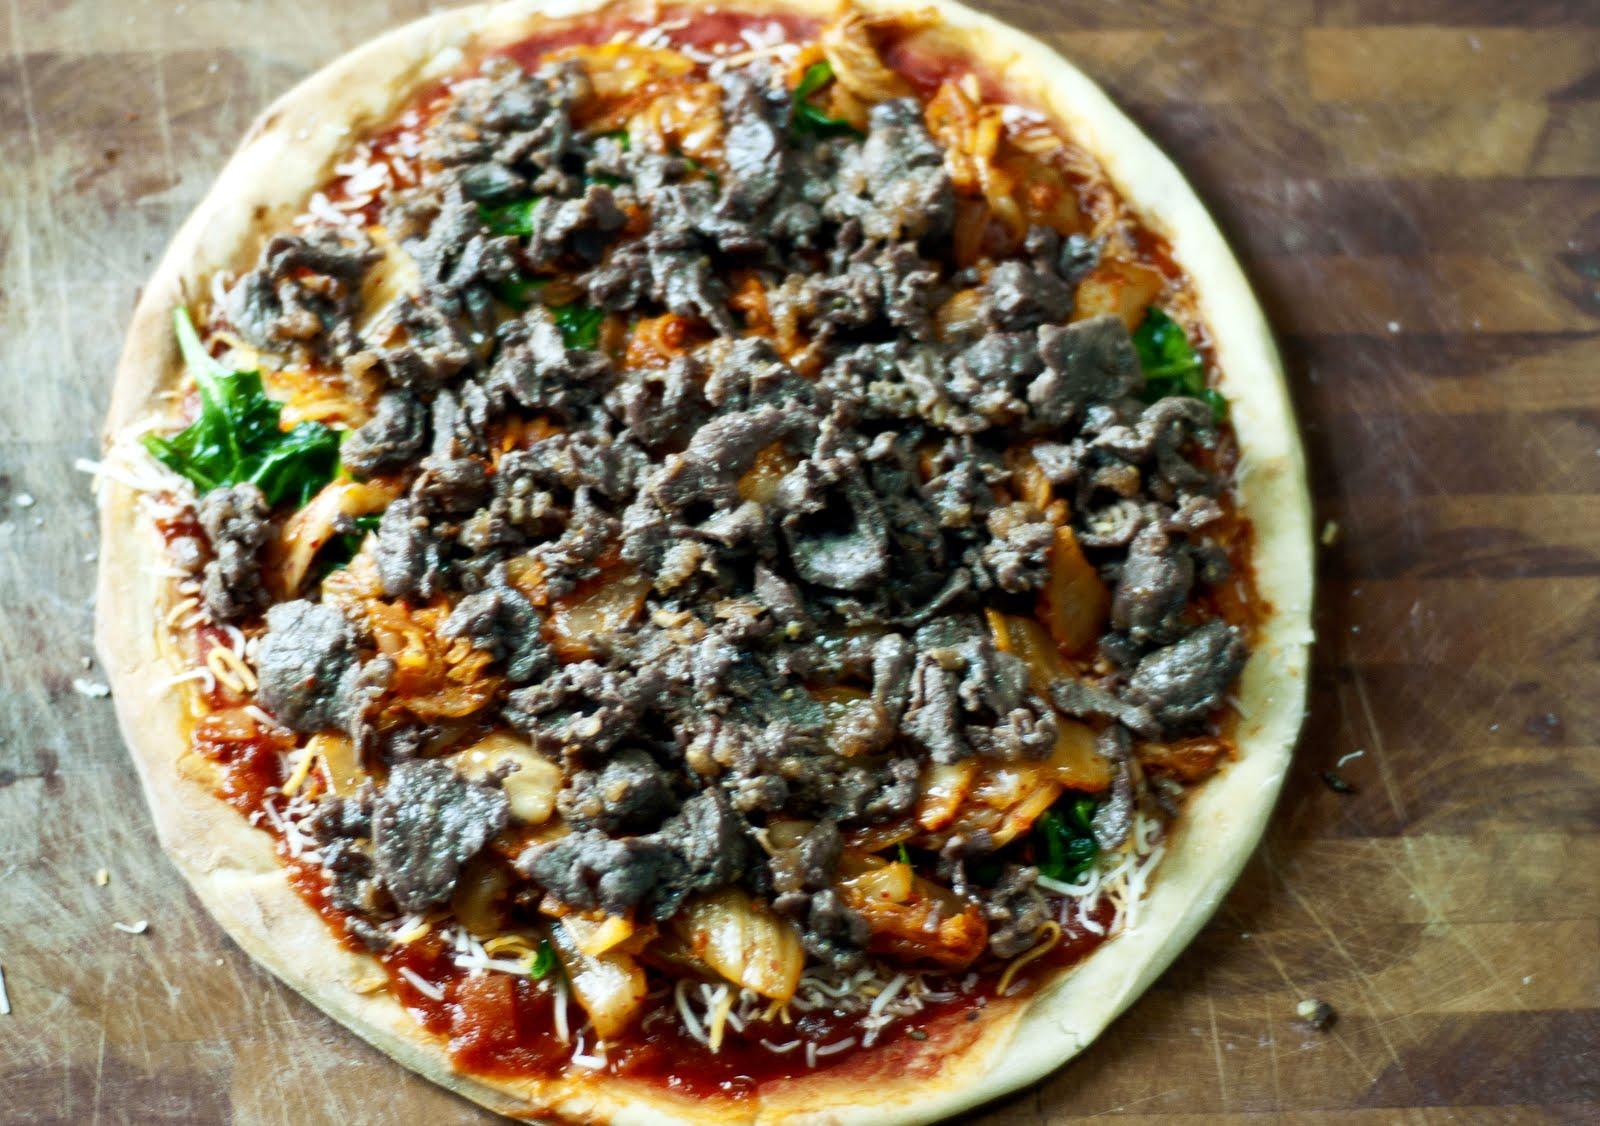 Basic Pizza Sauce Recipe picture